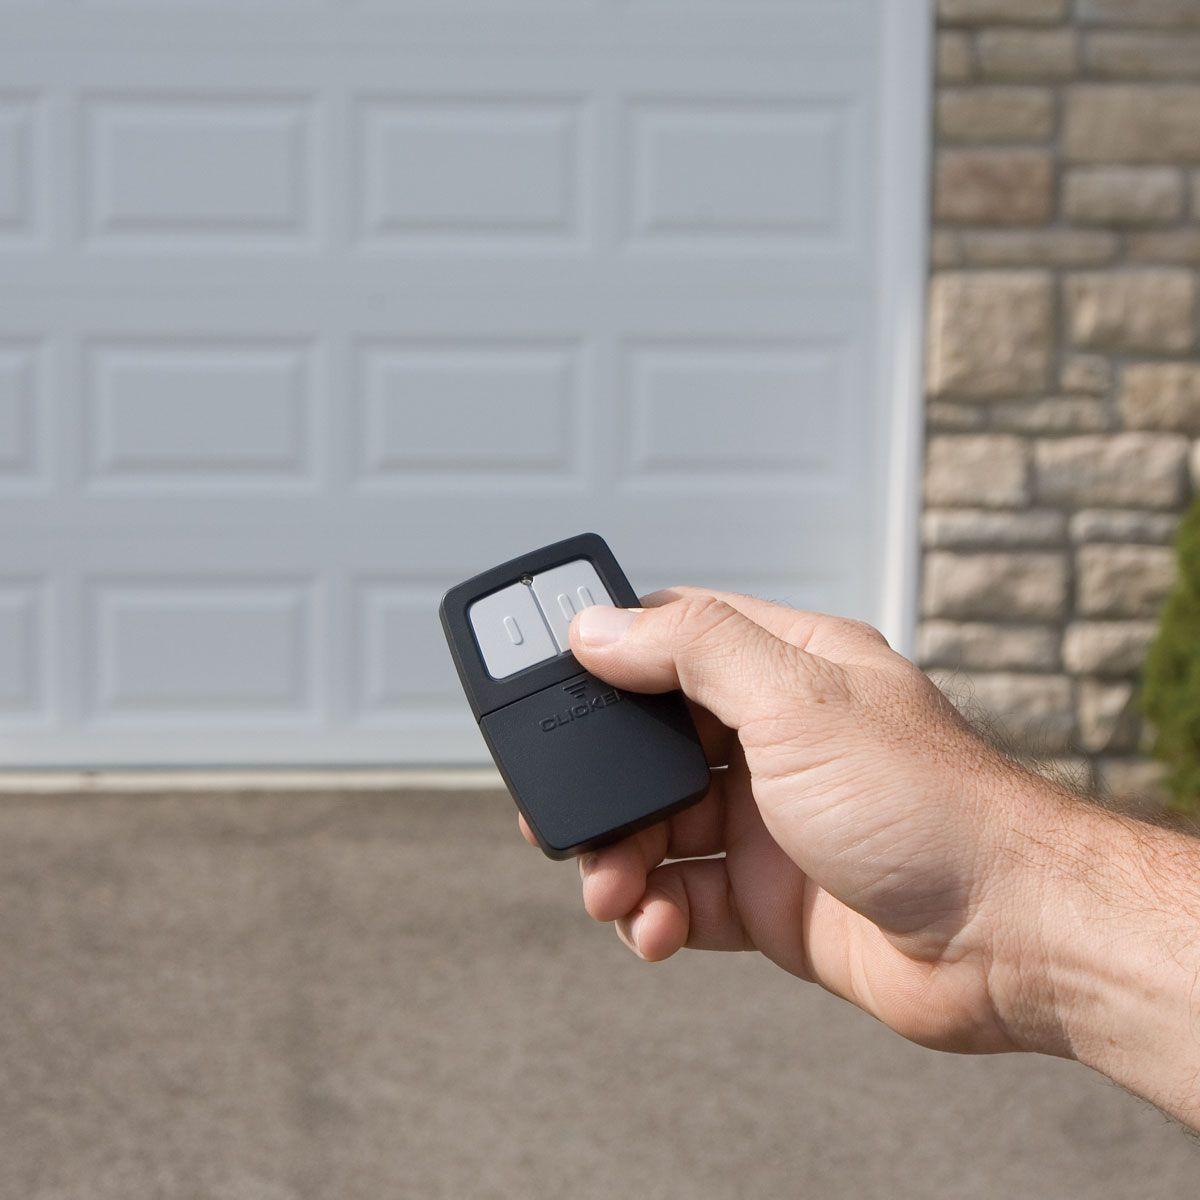 19 Reasons Your Garage Door Won T Open Or Close With Images Garage Door Opener Remote Garage Door Remote Best Garage Door Opener